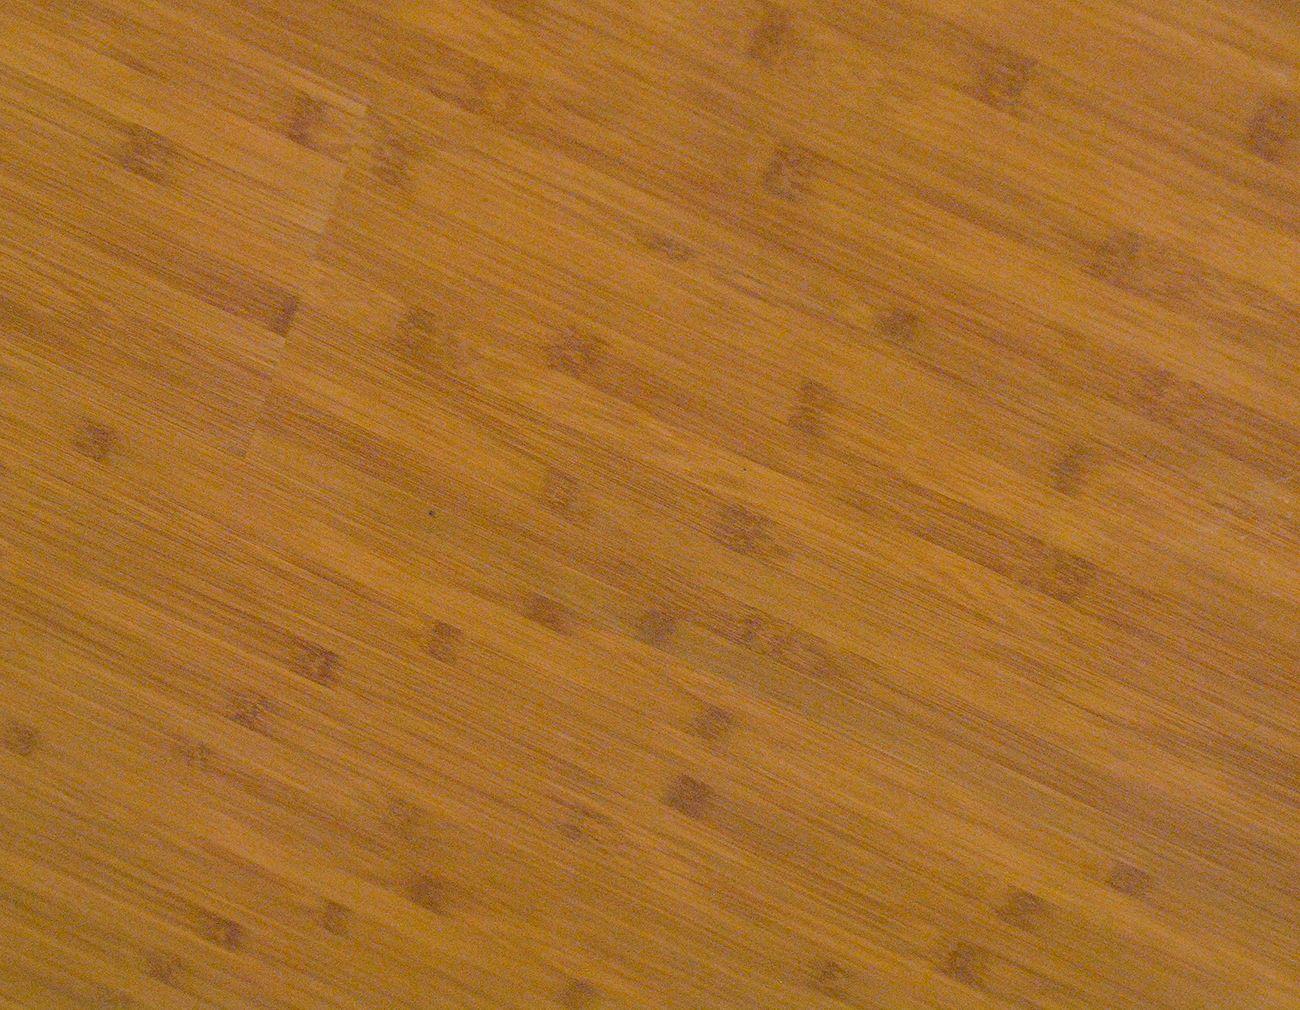 Tuff Guy Freedom Mountain Bamboo Waterproof Loose Lay Vinyl Plank Loose Lay Vinyl Planks Vinyl Flooring Loose Lay Vinyl